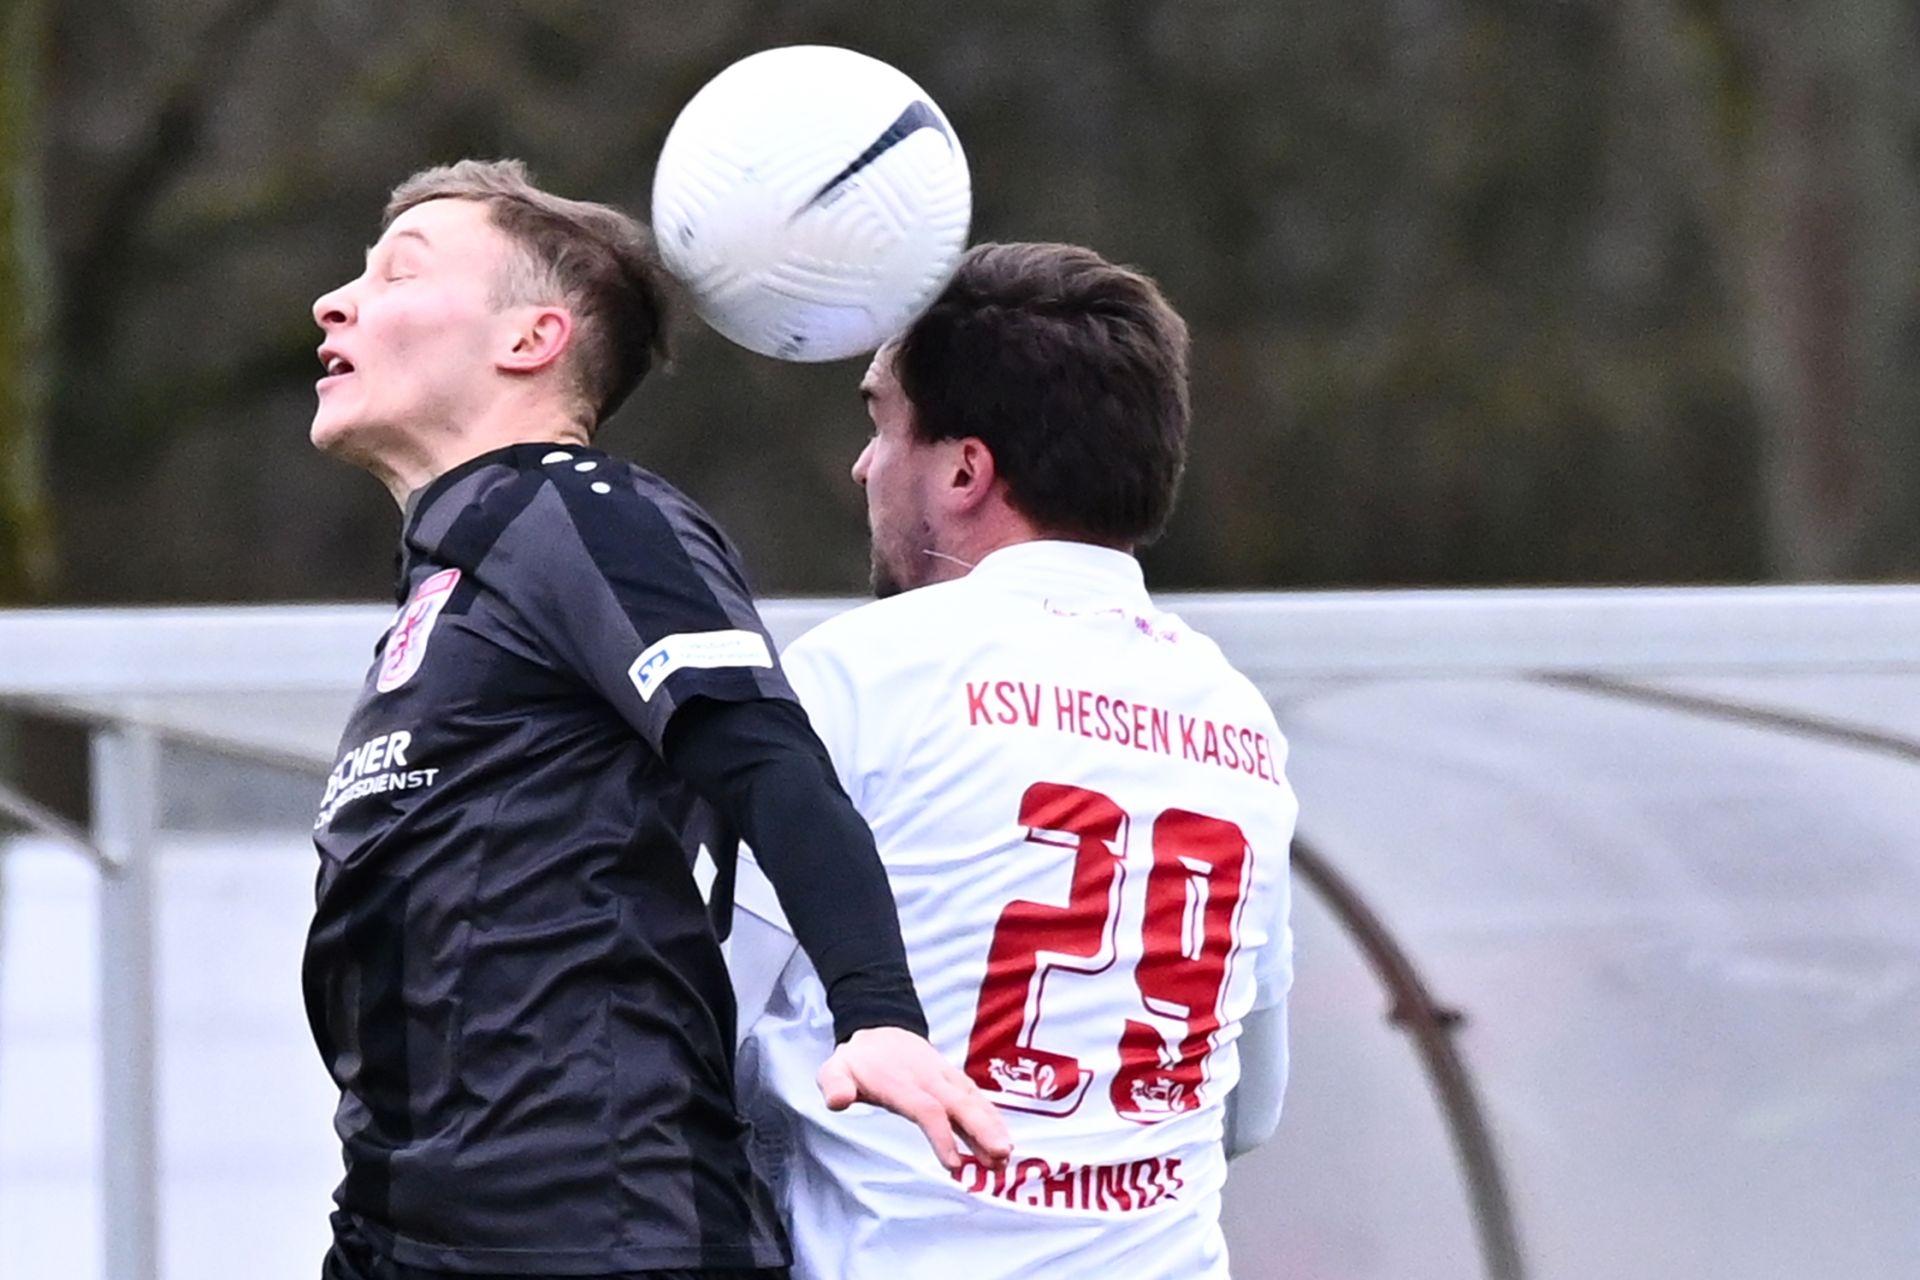 Regionalliga Südwest 2020/21, KSVHessen Kassel, FC Gießen, Endstand 1:1, Kopfballduell, Nils Pichinot